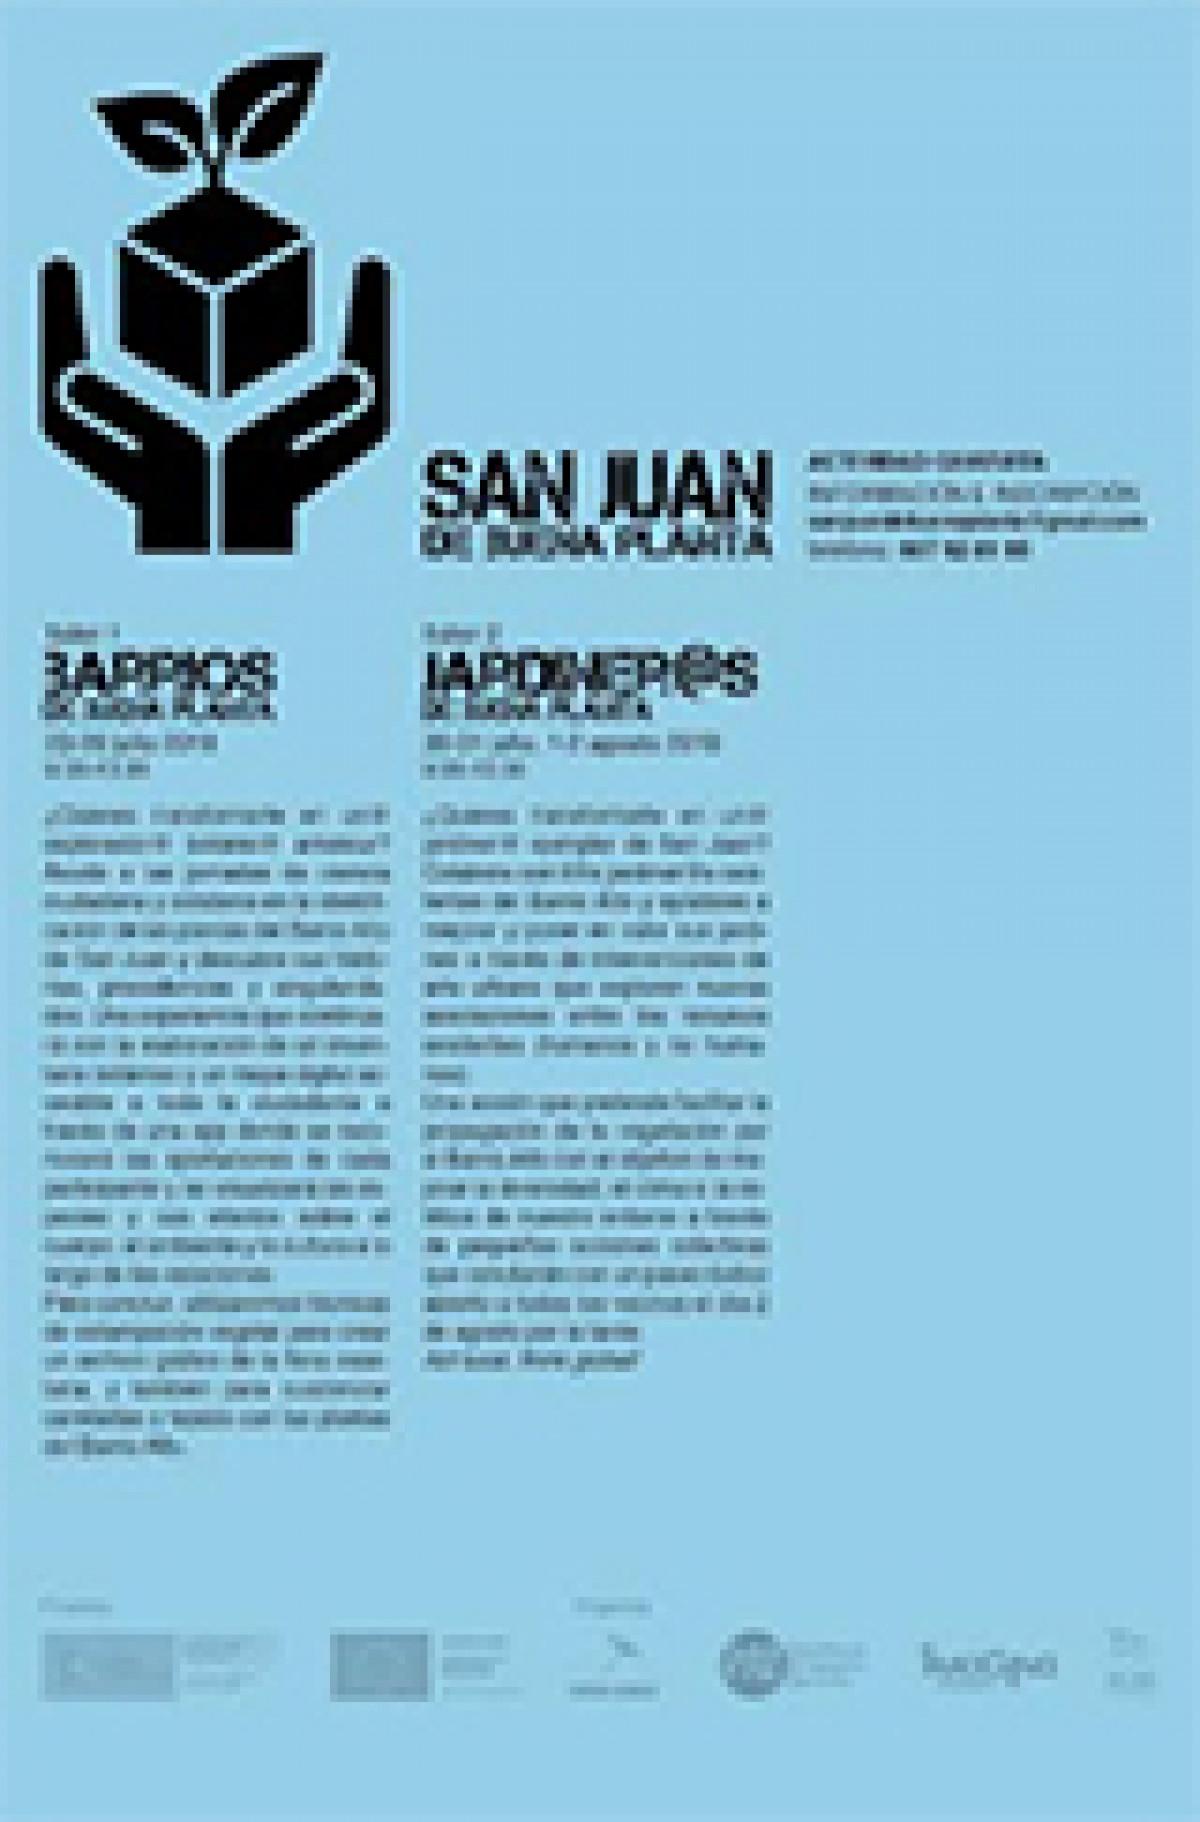 San juan planta